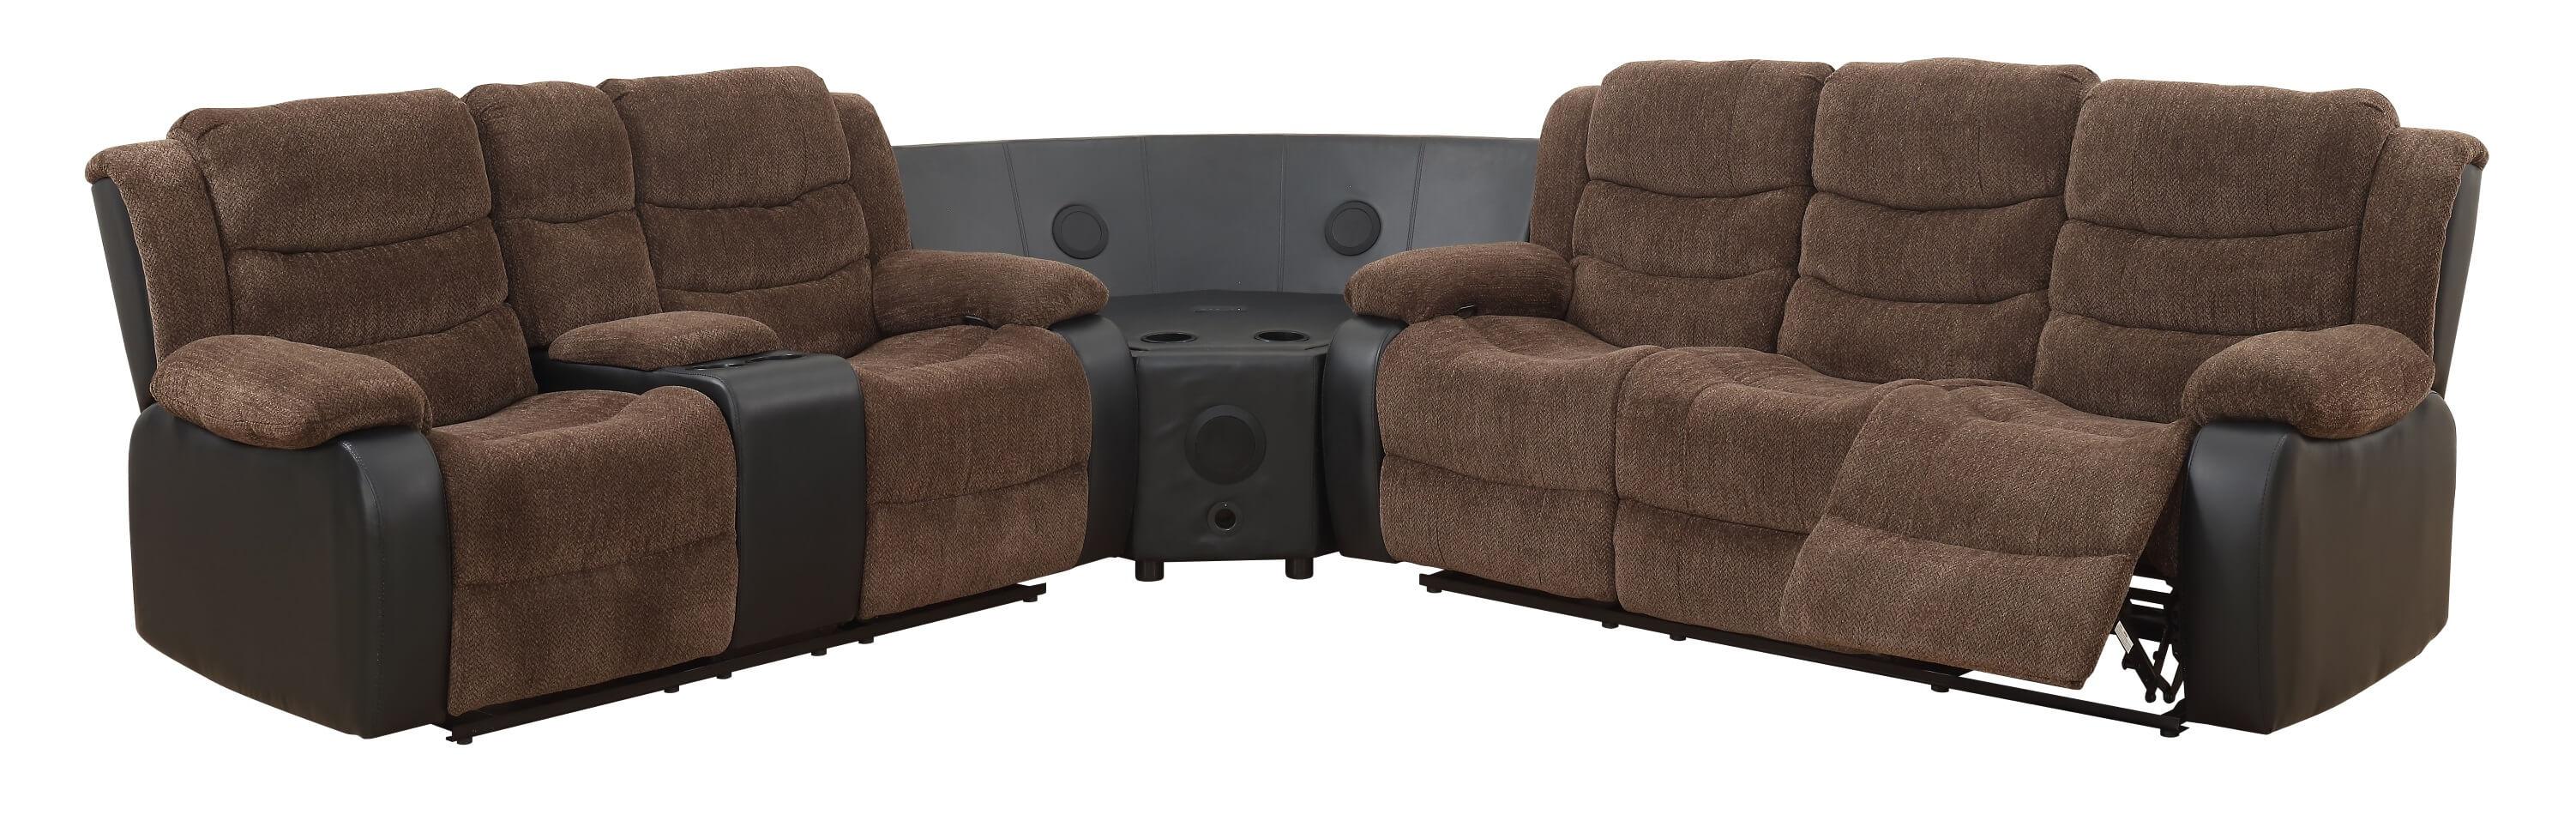 Sensational U125 Enzo Dijon Stereo Sectional Discontinued Machost Co Dining Chair Design Ideas Machostcouk